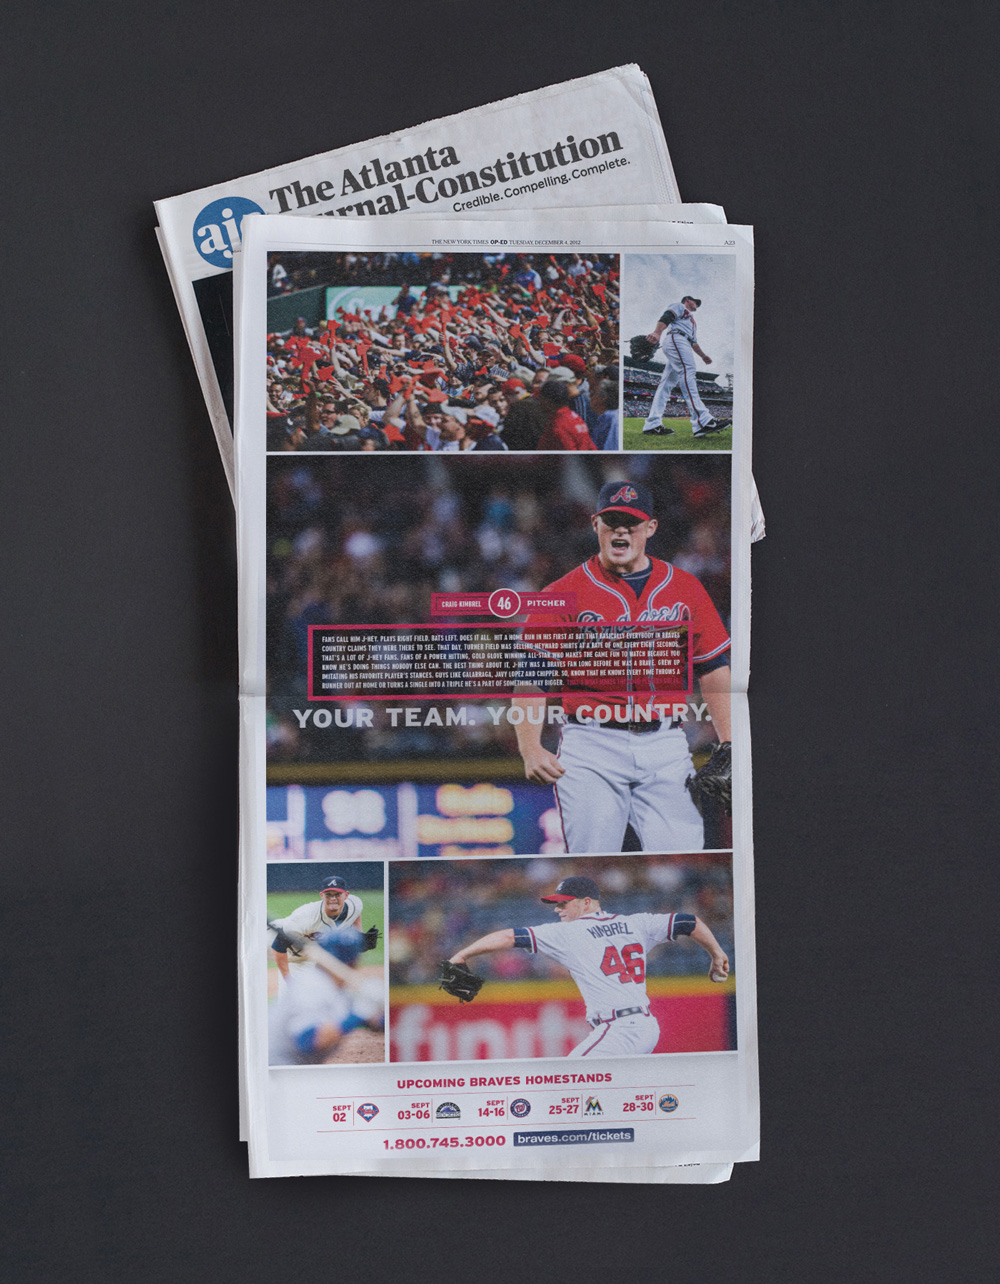 braves_newspaper_4.jpg